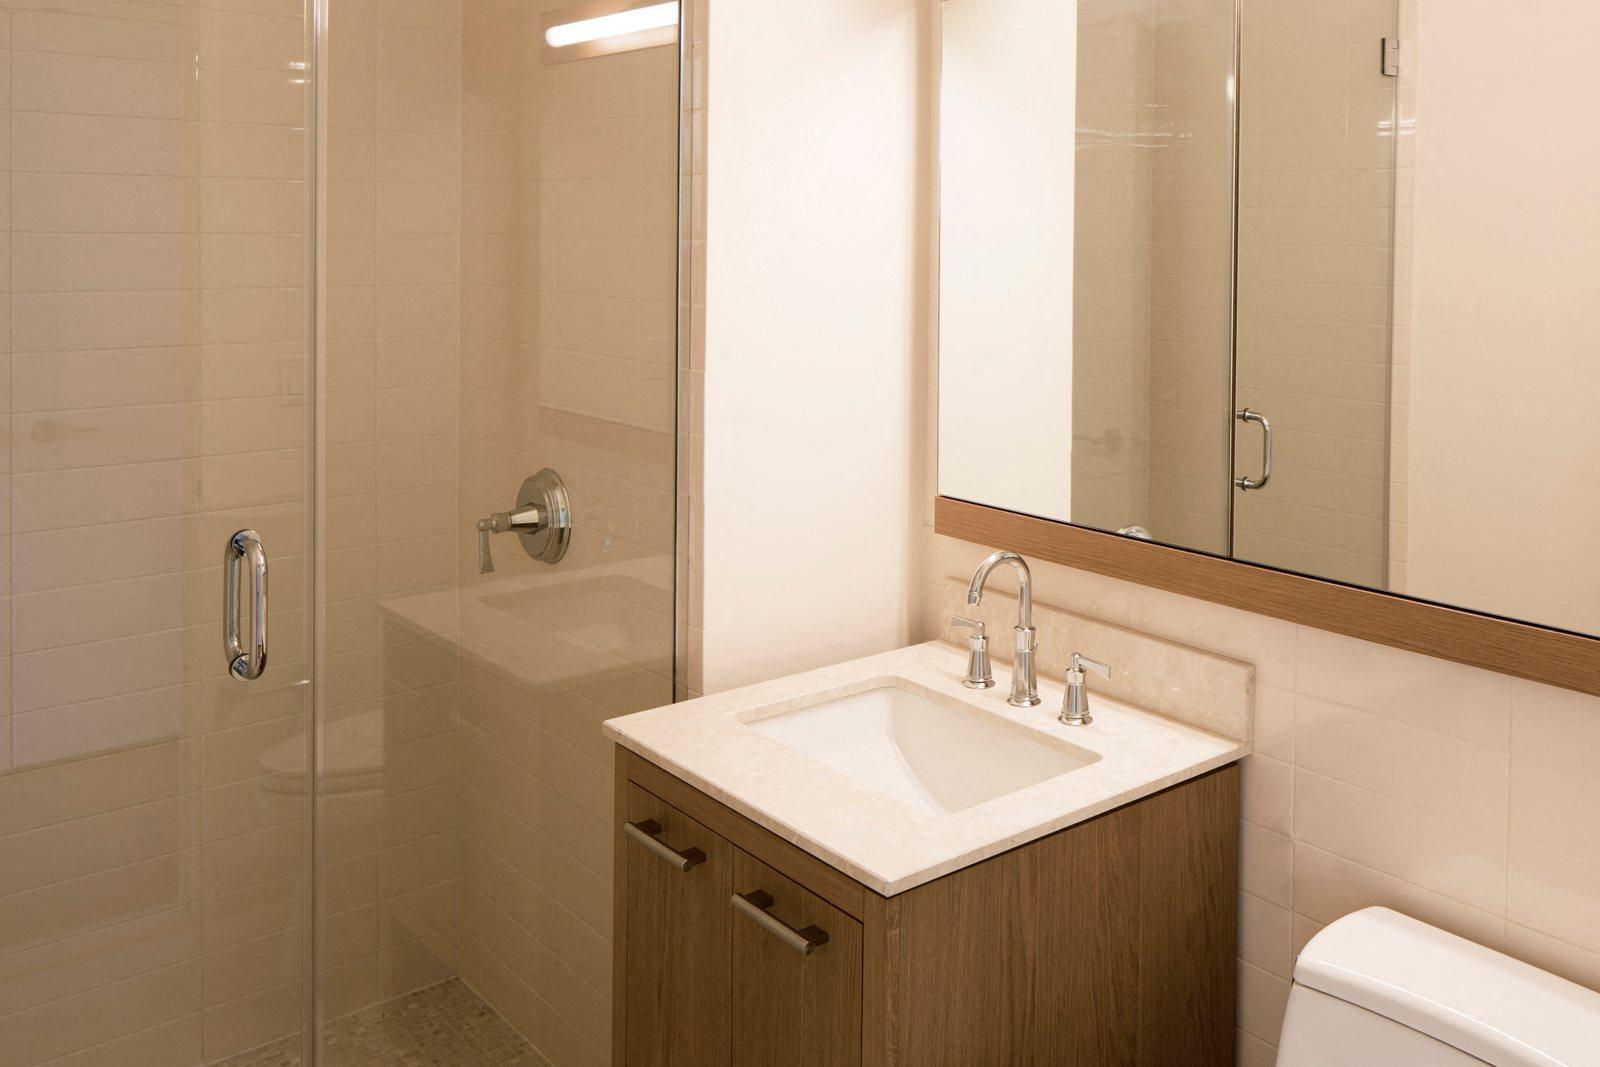 Modern Bathrooms at The Ashley Apartments, New York, New York